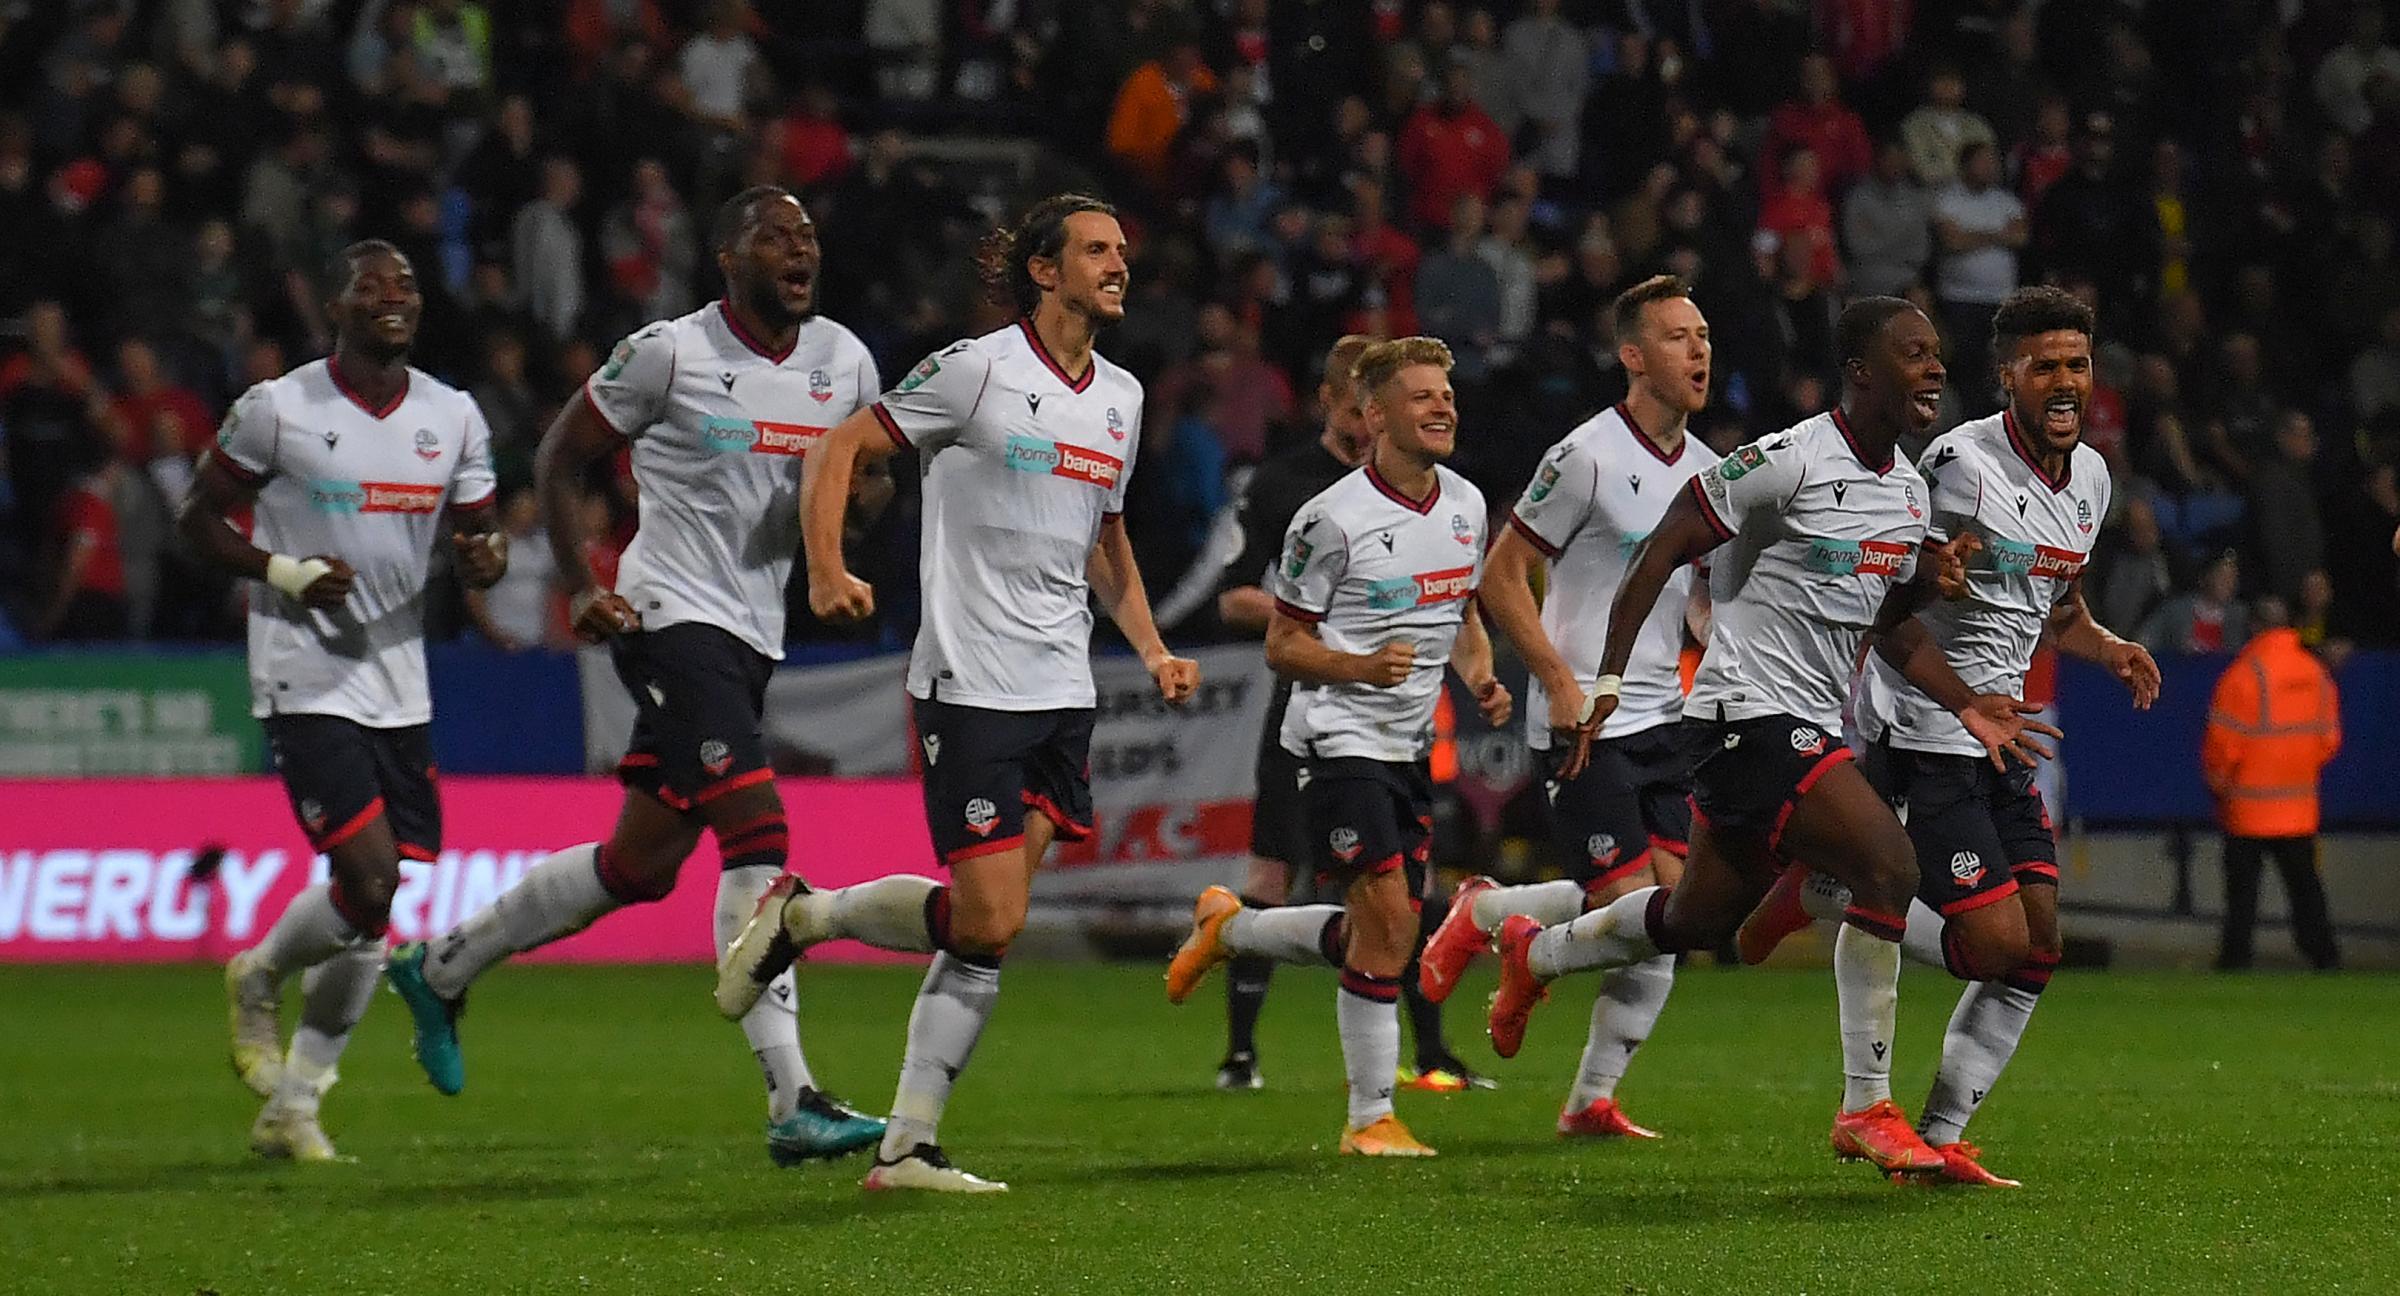 Bolton 0-0 Barnsley (5-4 penalties) - Carabao Cup big match verdict